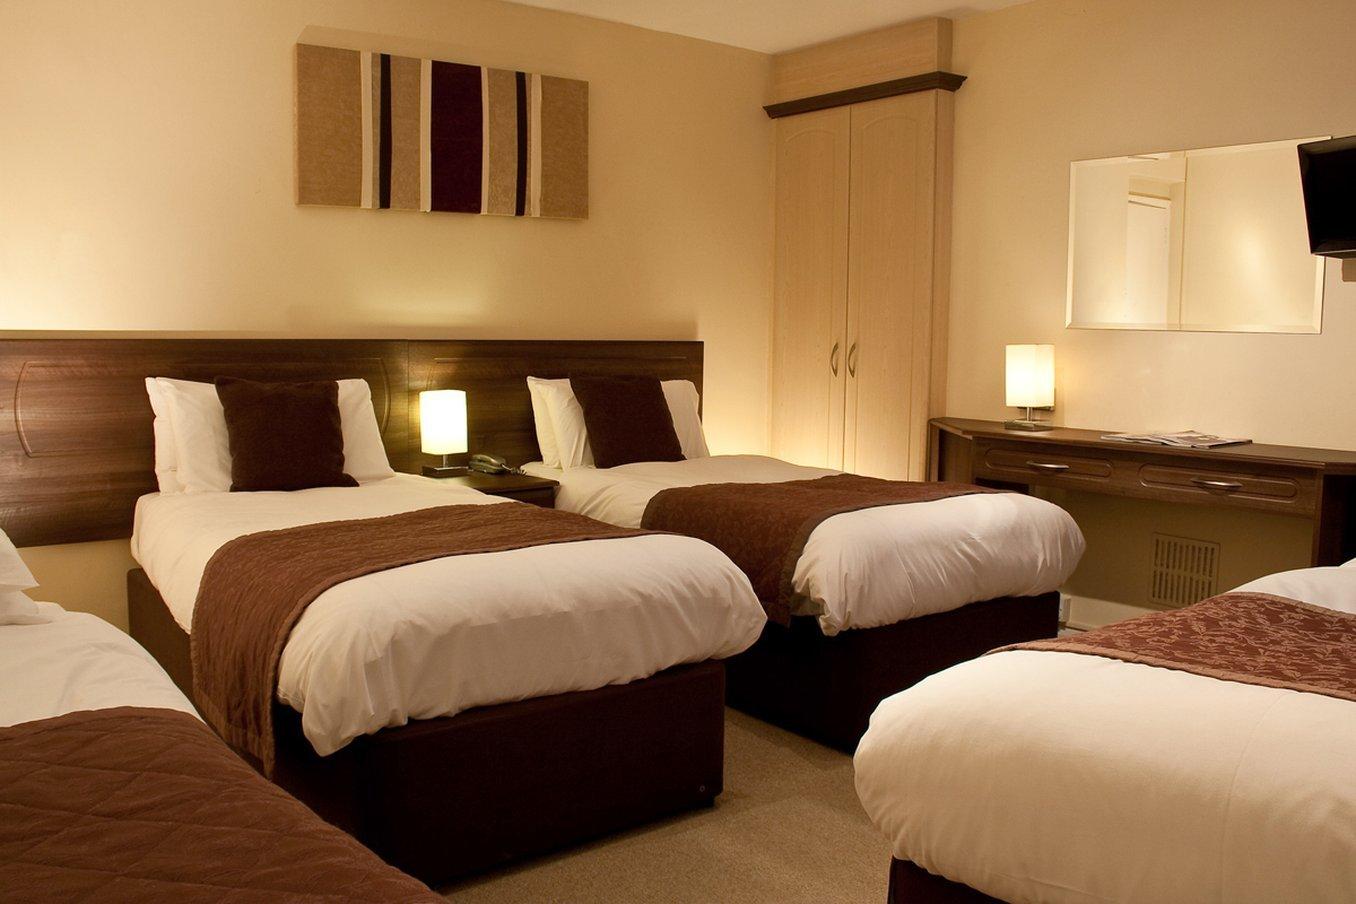 New steine hotel updated 2017 b b reviews price for Anatolia cuisine brighton